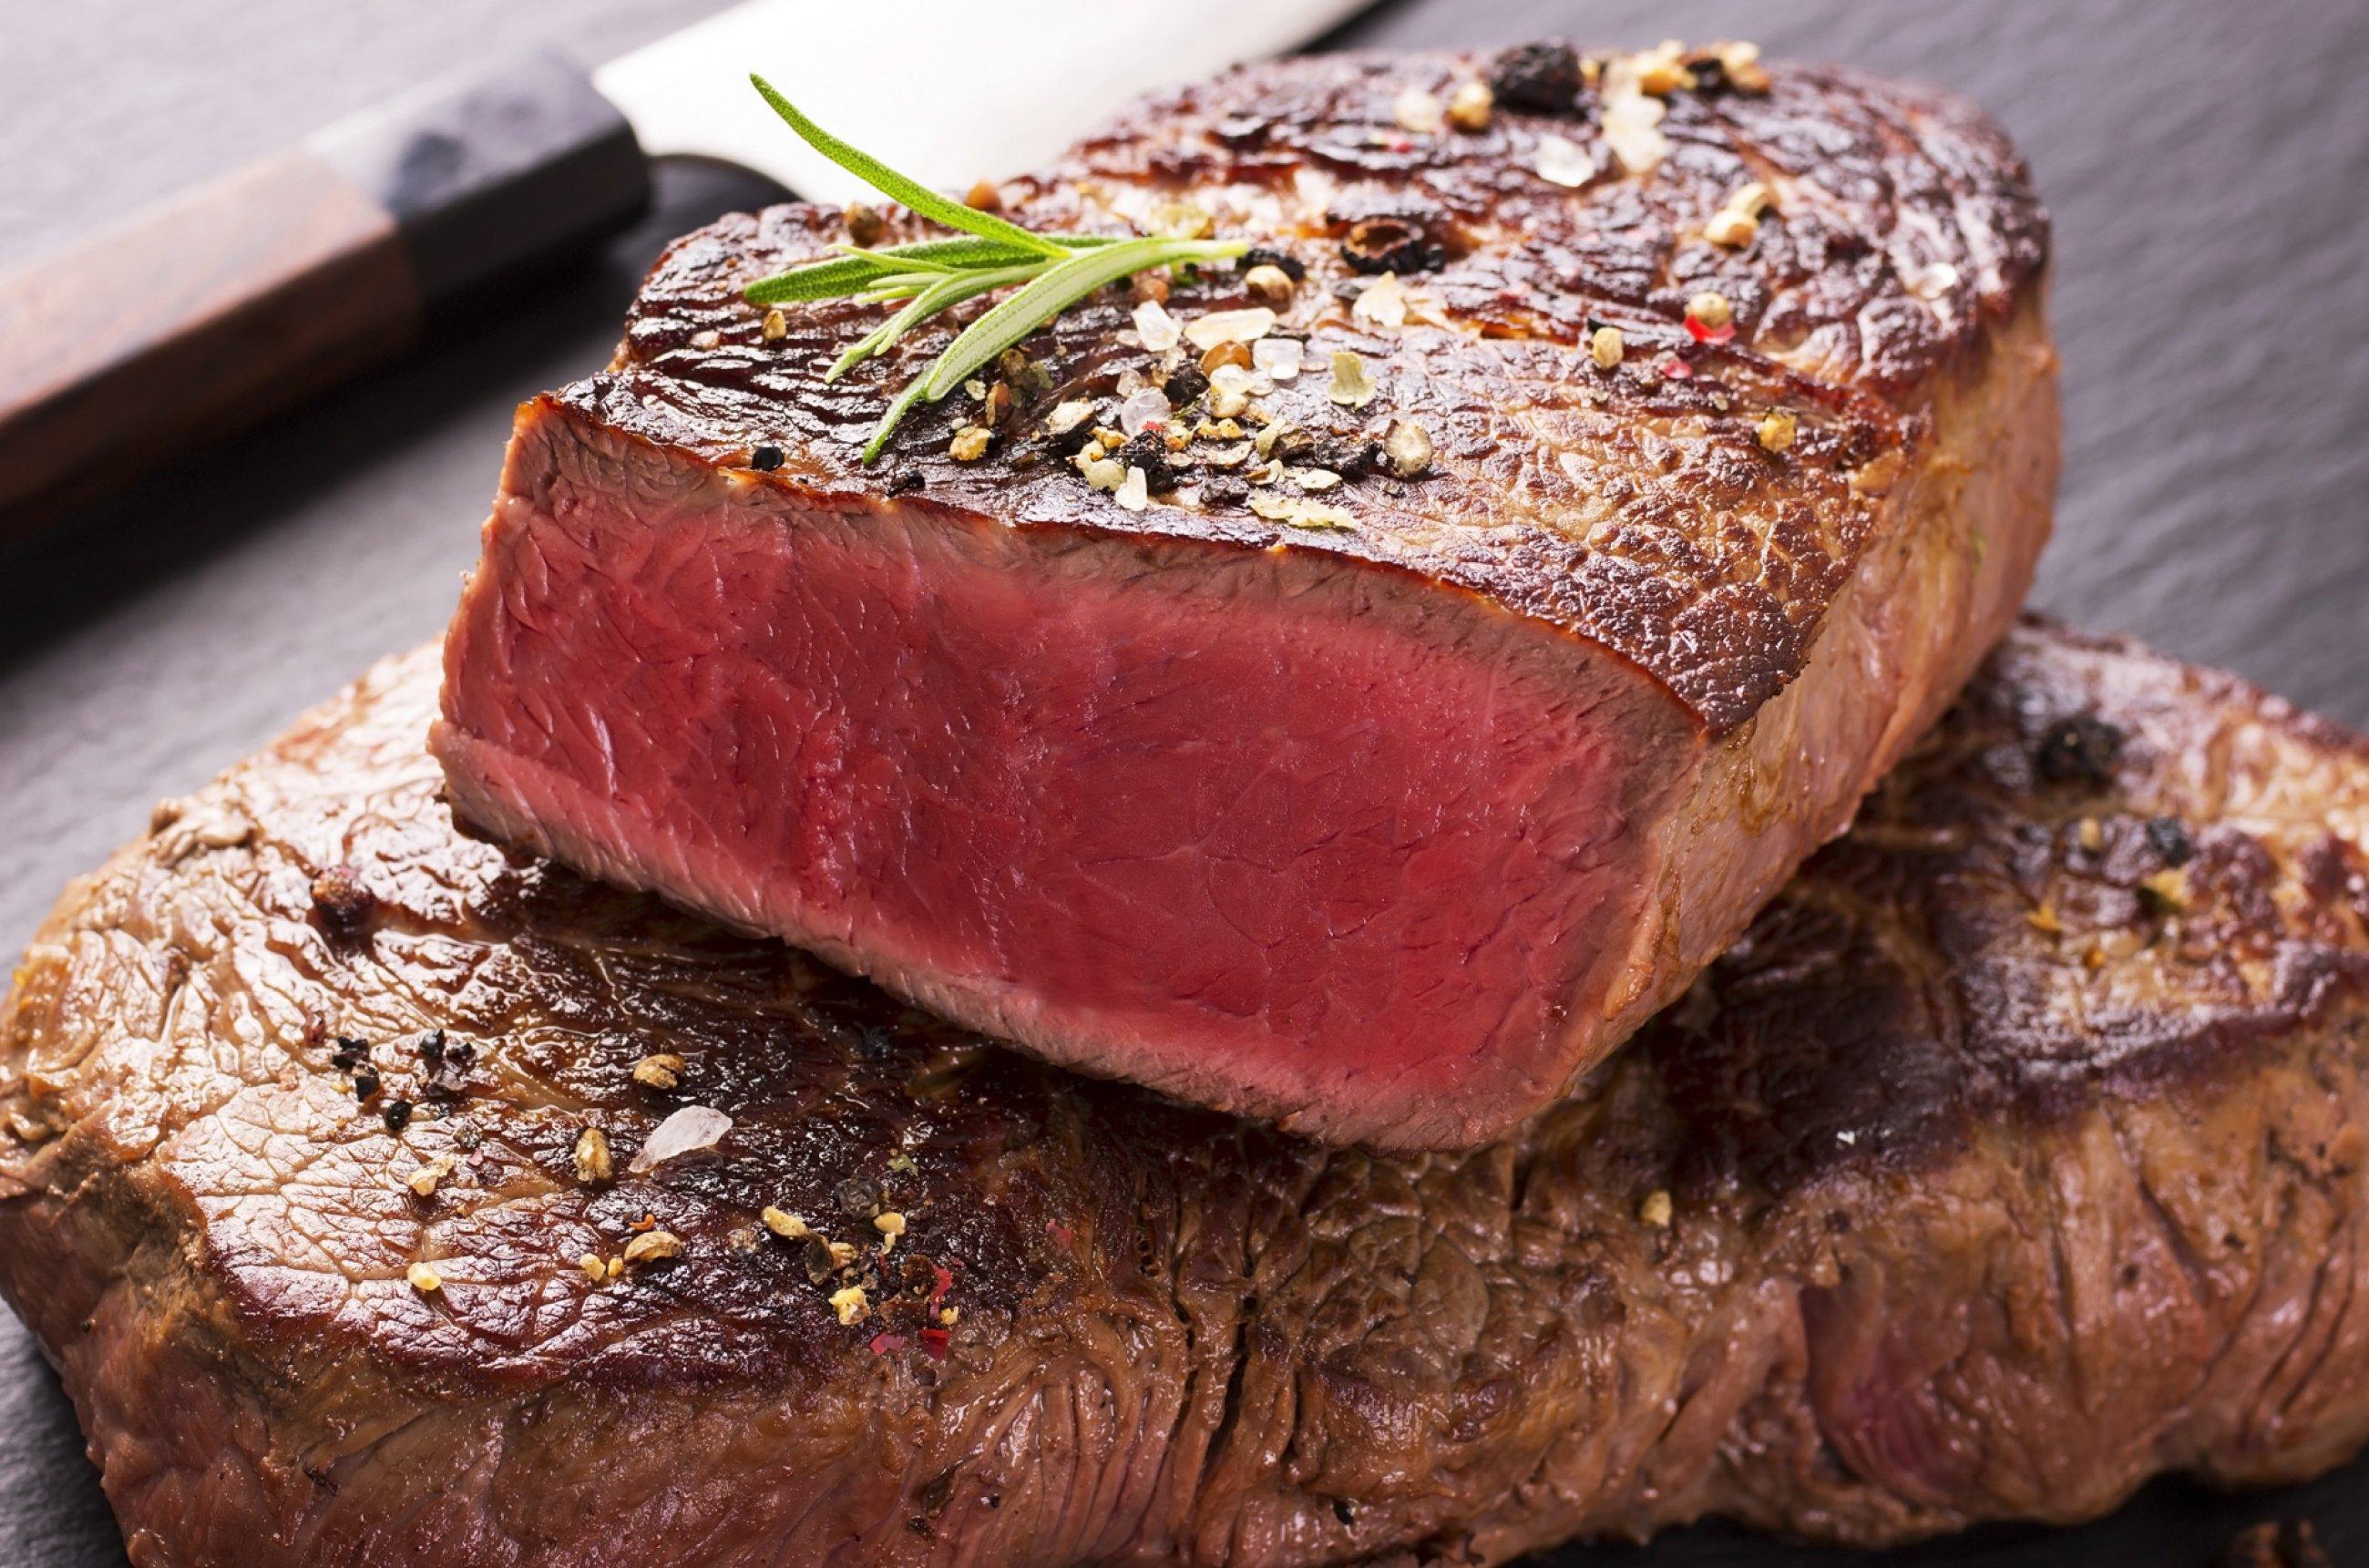 https://bubo.sk/uploads/galleries/7302/jar-steak.jpg